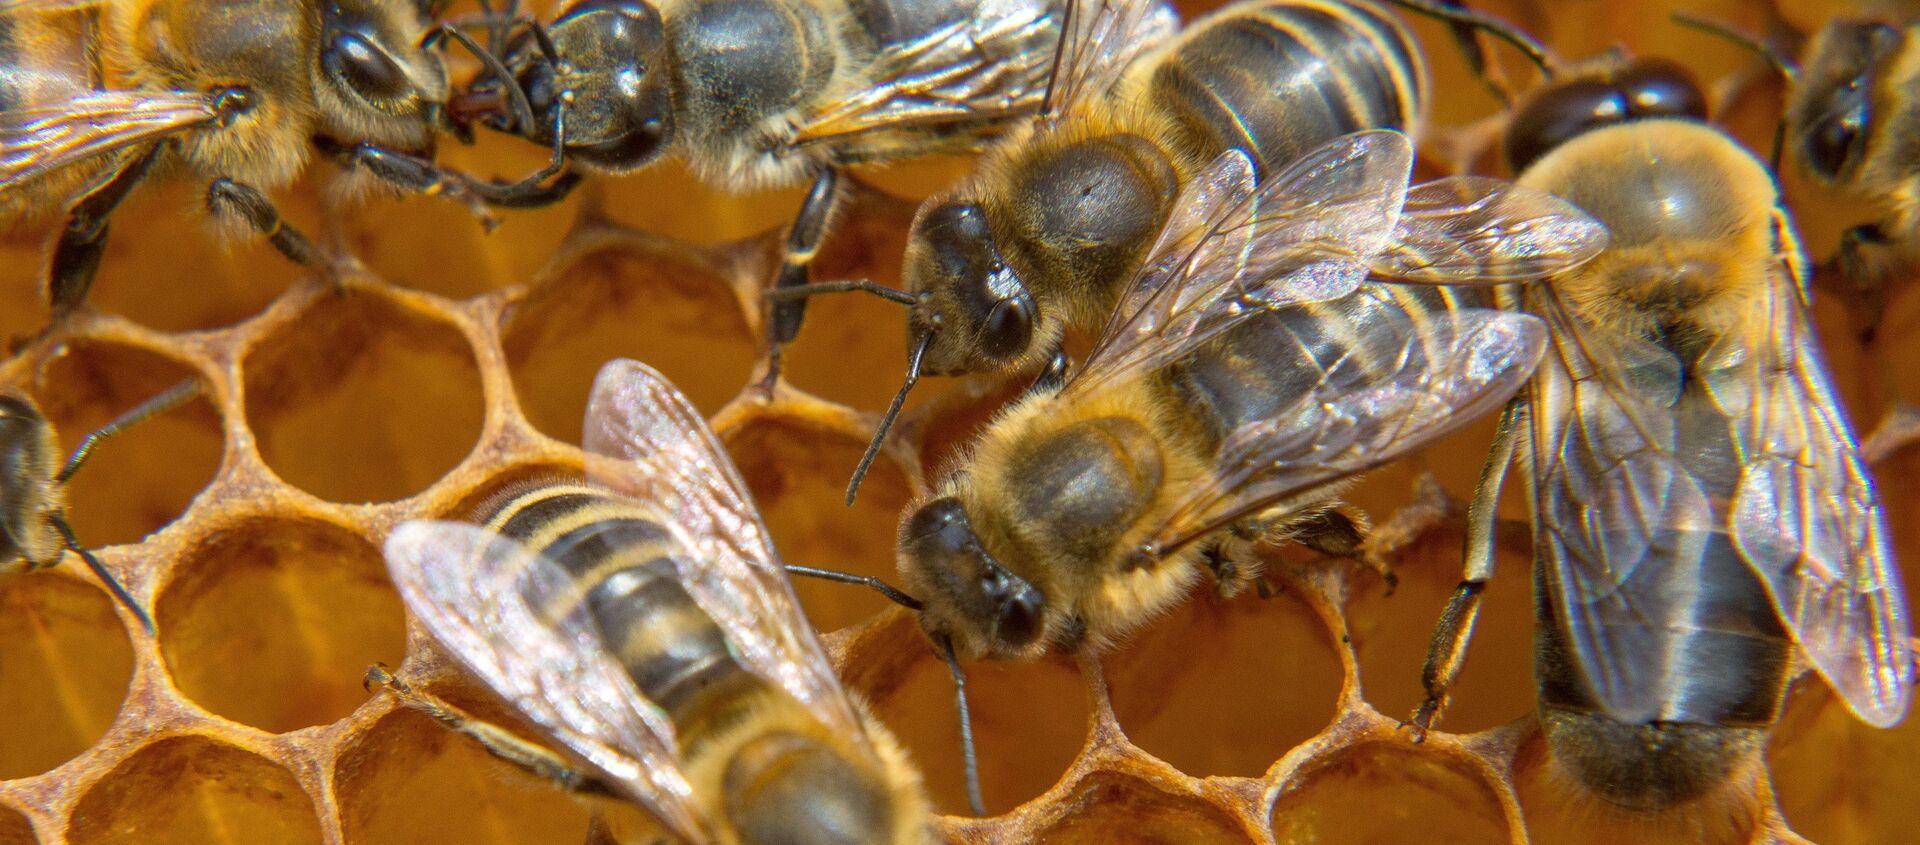 Una colmena de abejas (imagen referencial) - Sputnik Mundo, 1920, 21.05.2020